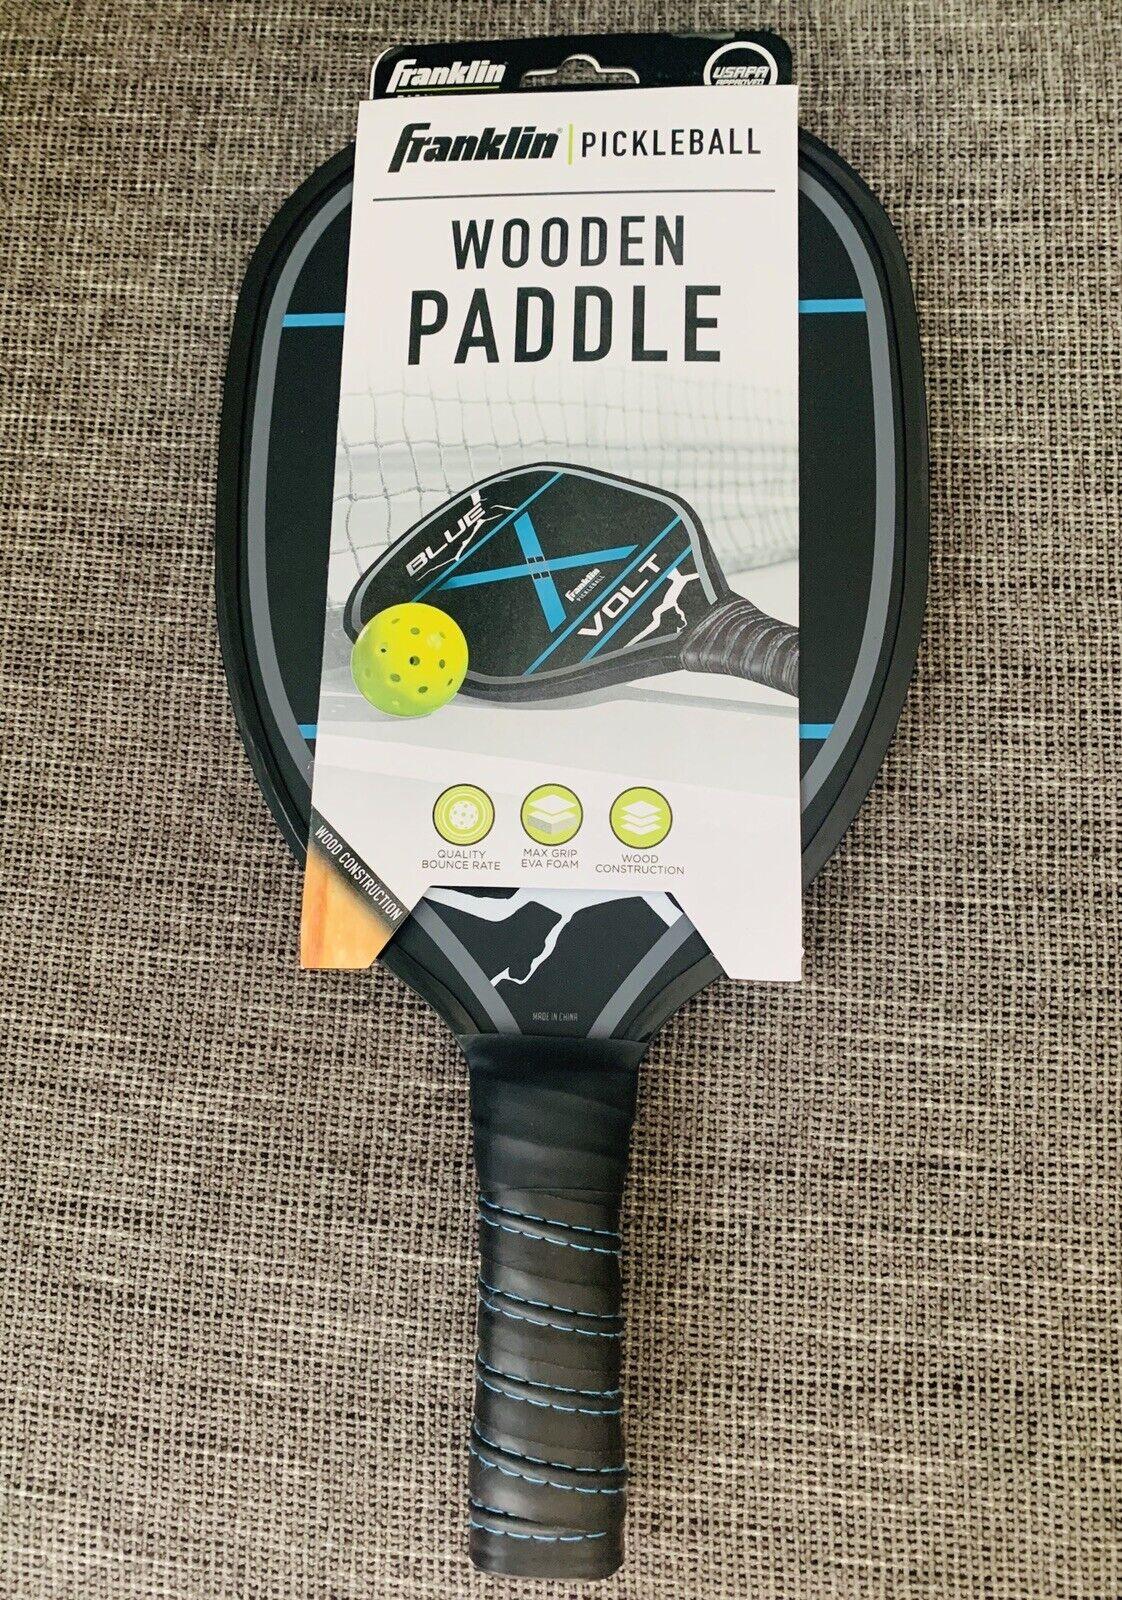 Franklin Sports Pickleball Wooden Paddle Blue Volt USAPA Approved for sale online